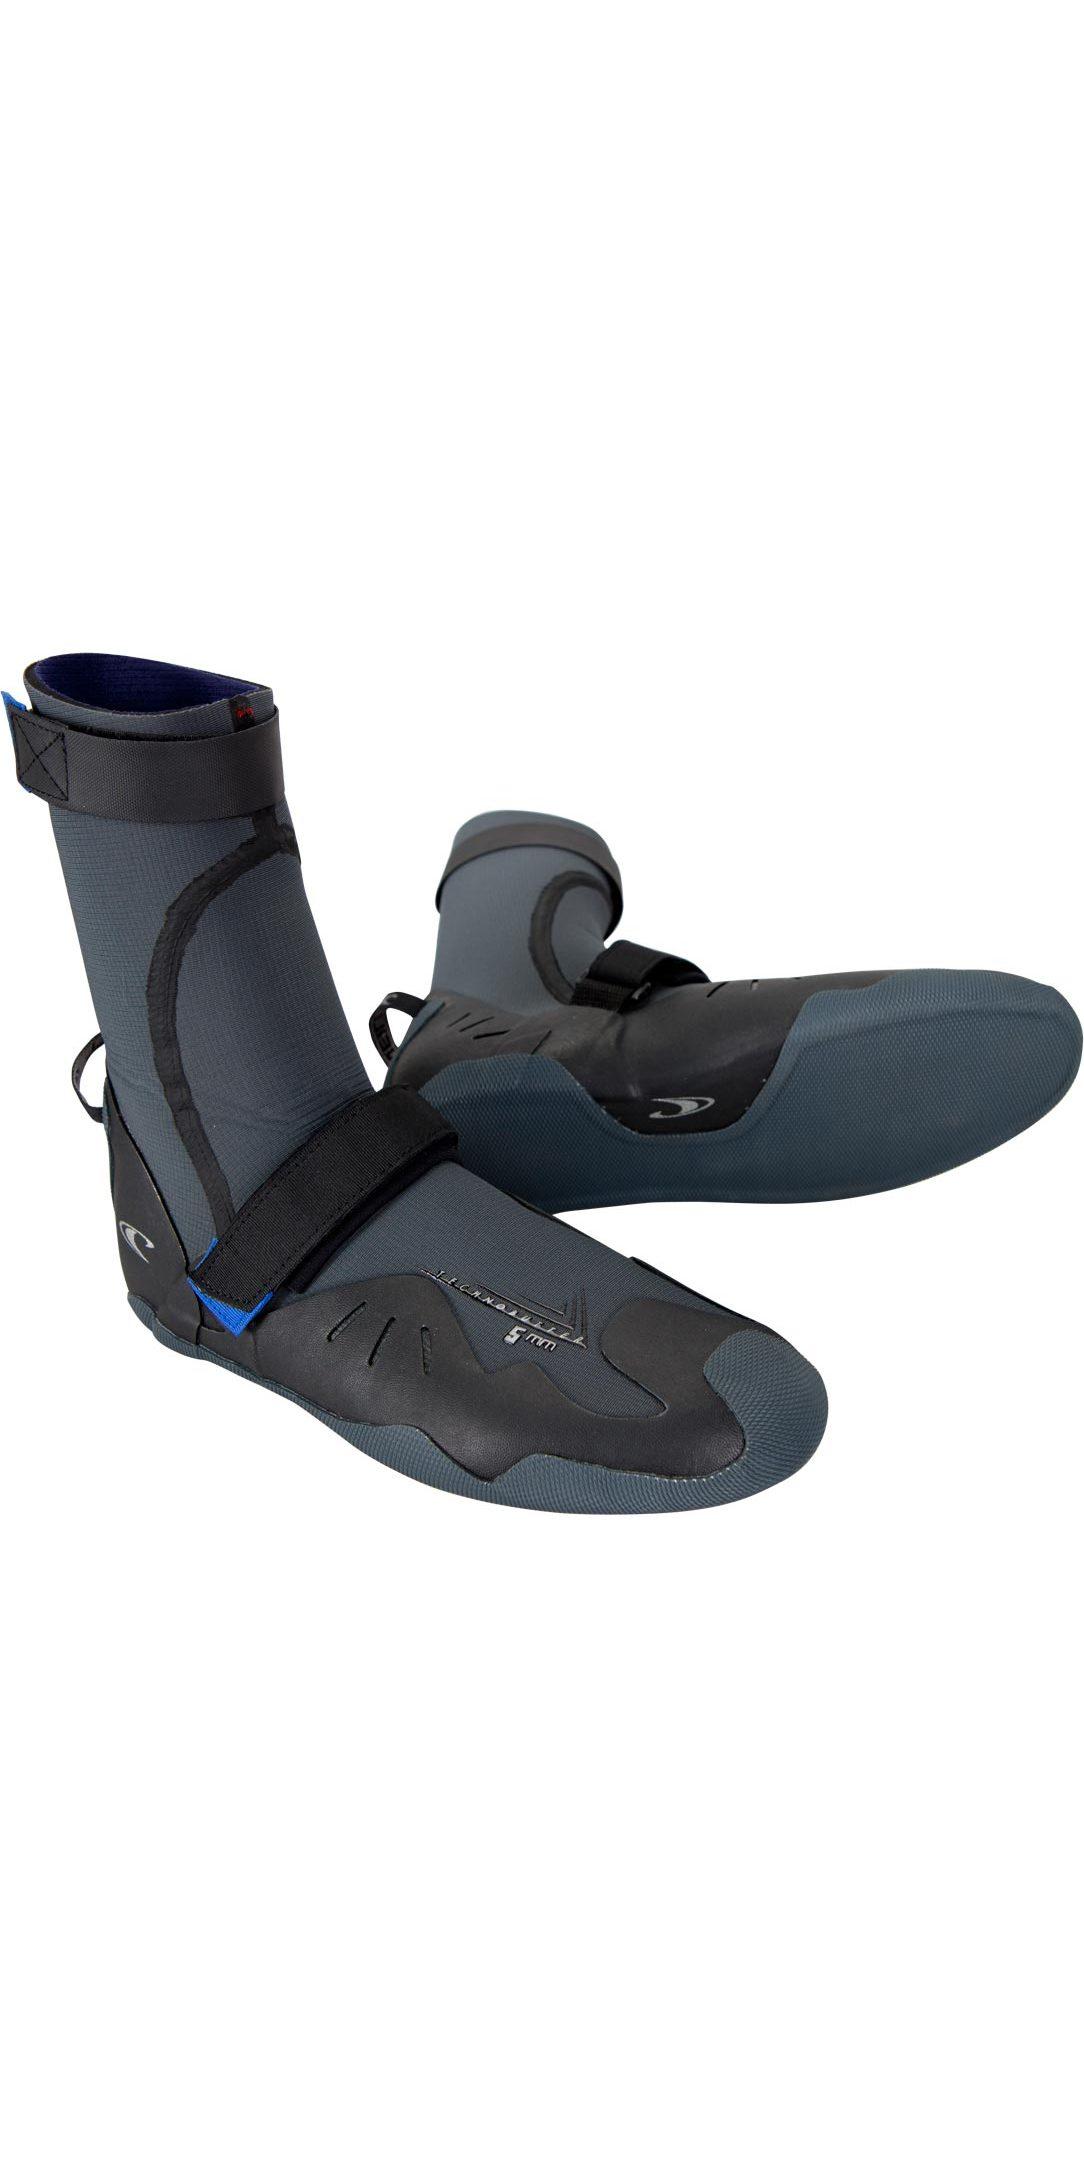 2018 O'Neill Psycho Tech 5mm Round Toe Boots 4977